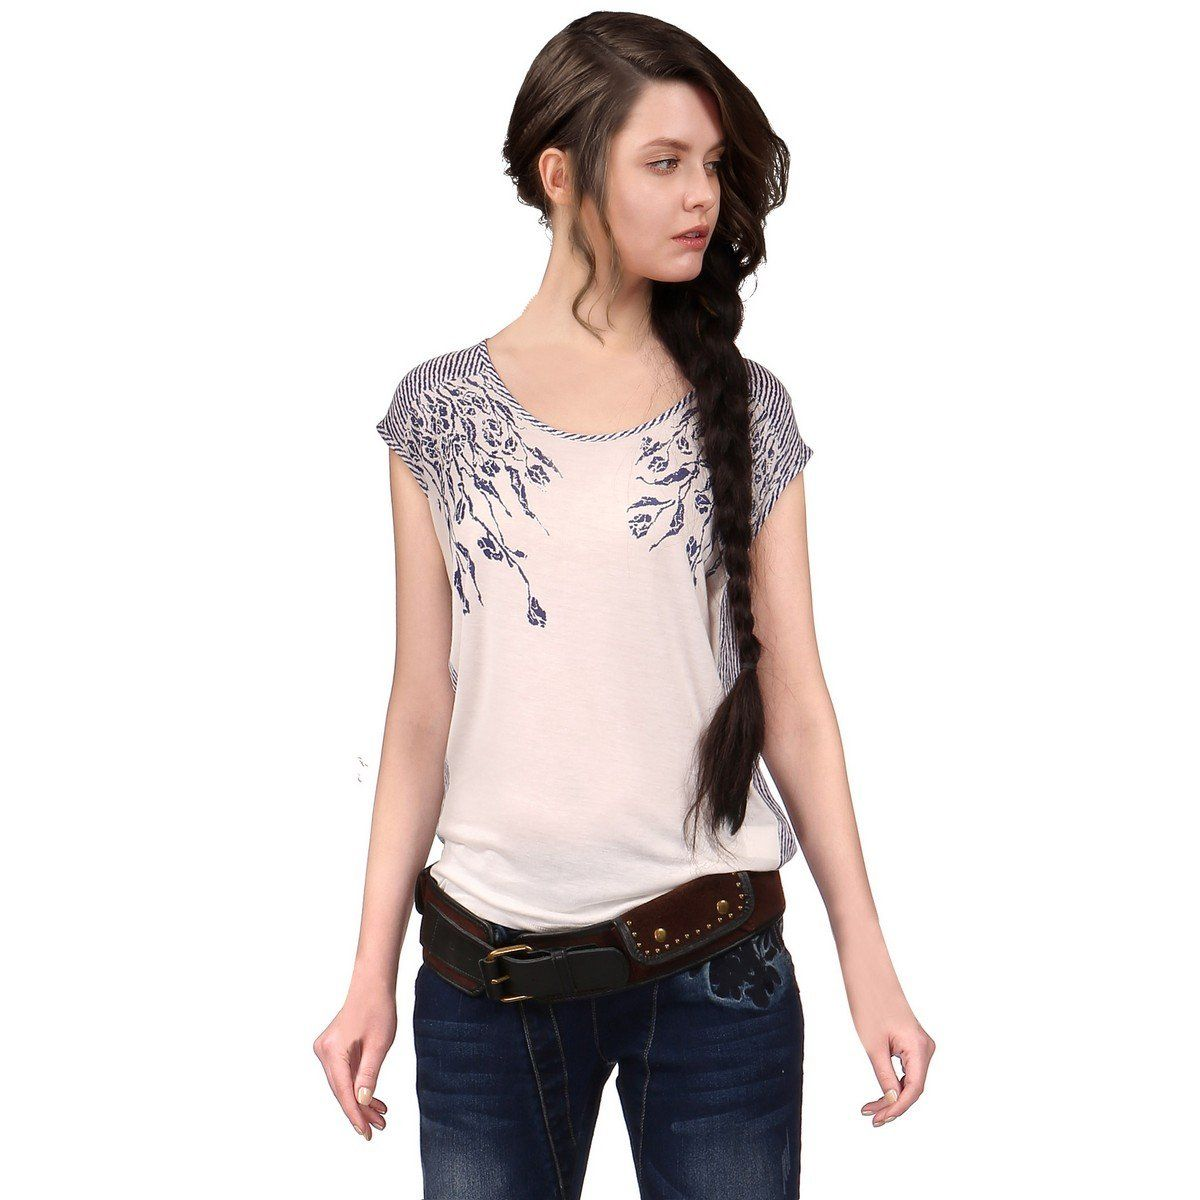 Artka Women's Ethnic All-match Loose Blue Print Sleeveless T-shirt at Amazon Women's Clothing store: